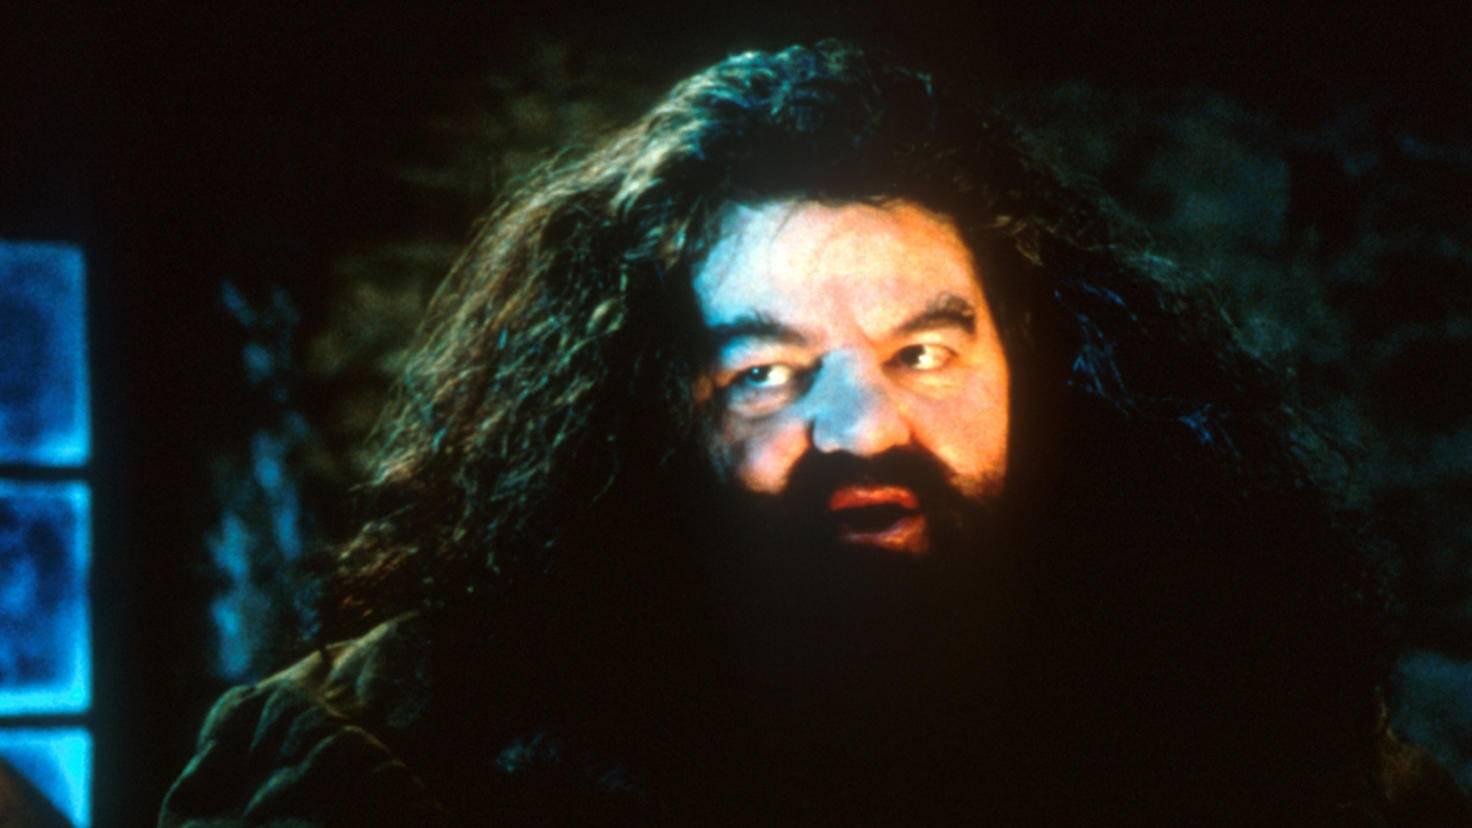 Harry Potter Rubeus Hagrid